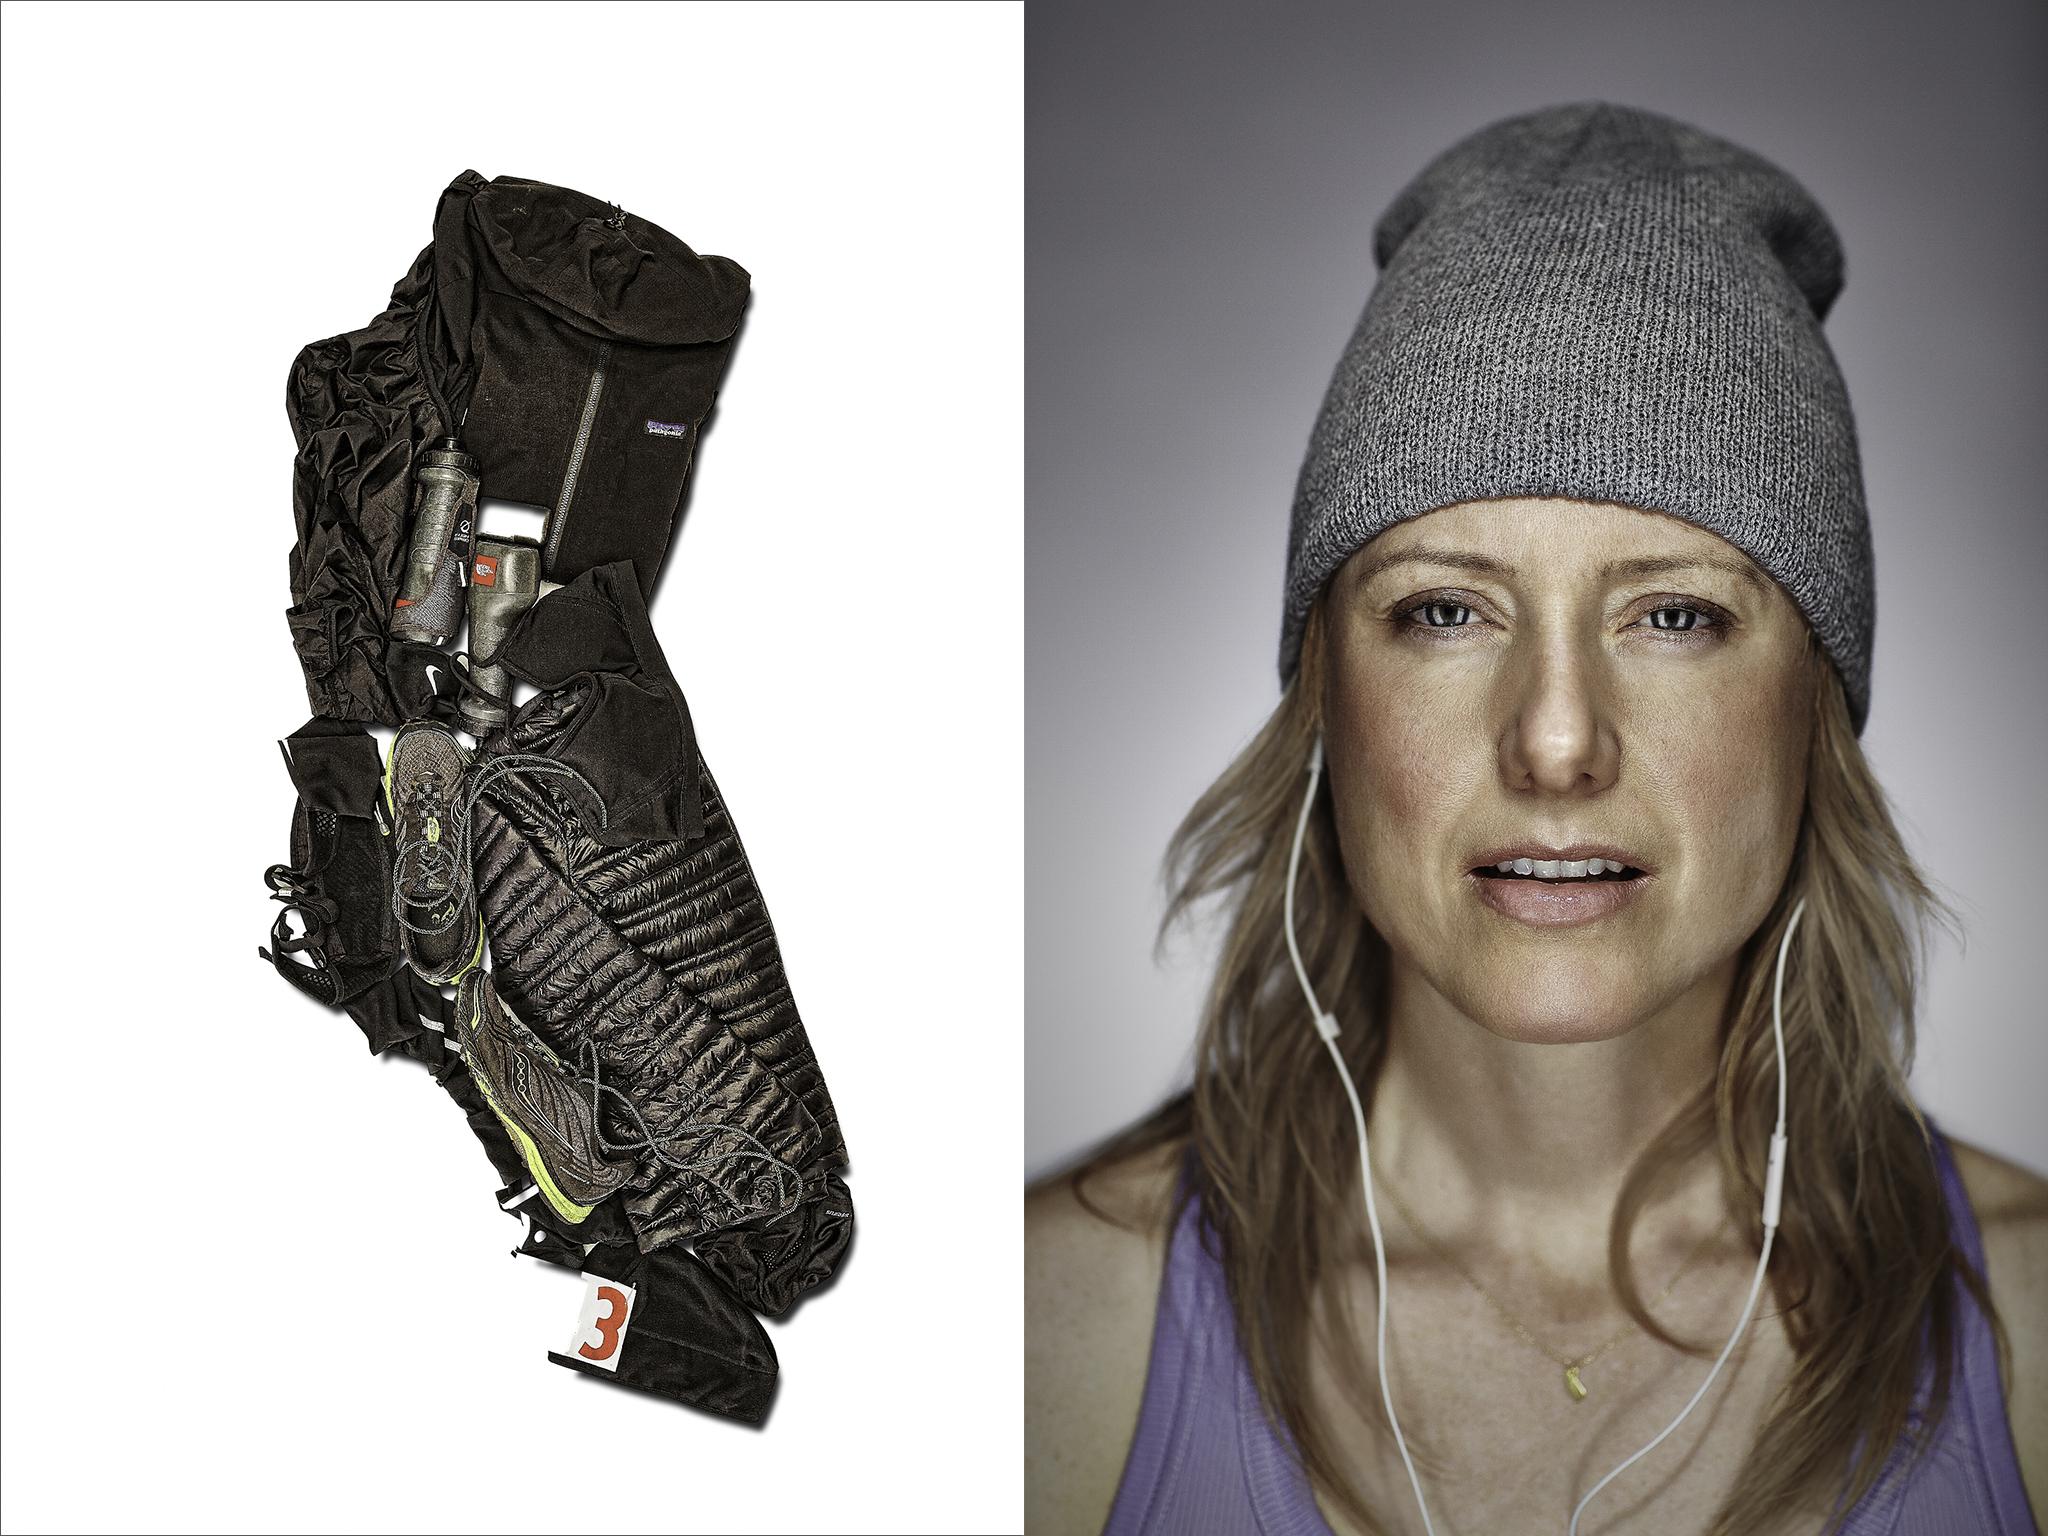 Jennifer Pattee - Fitness Maven & Entrepreneur   Vance Jacobs Photography